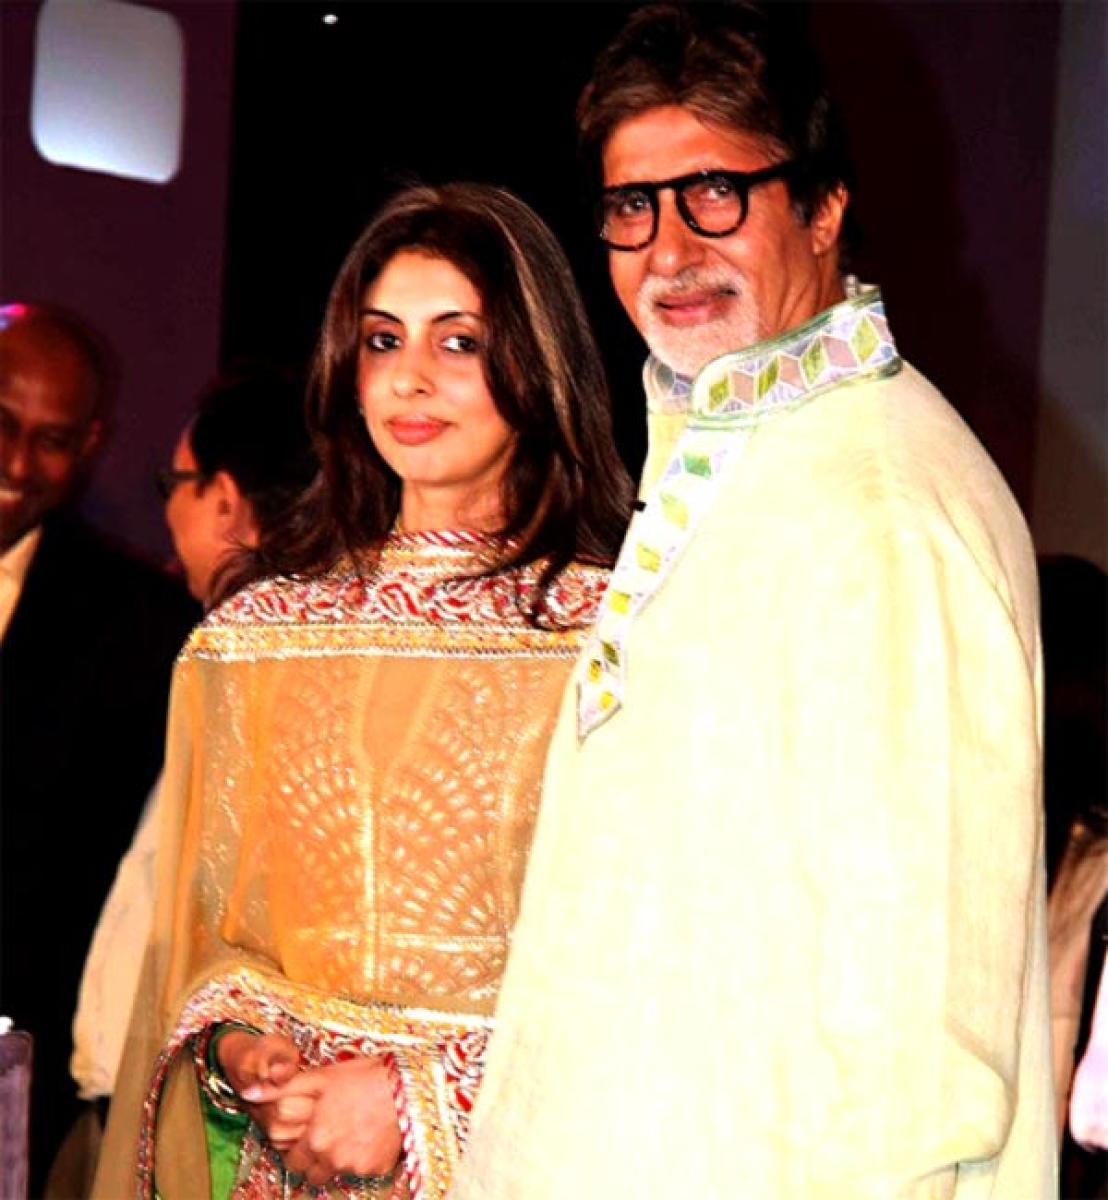 Amitabh Bachchan's daughter pens debut novel